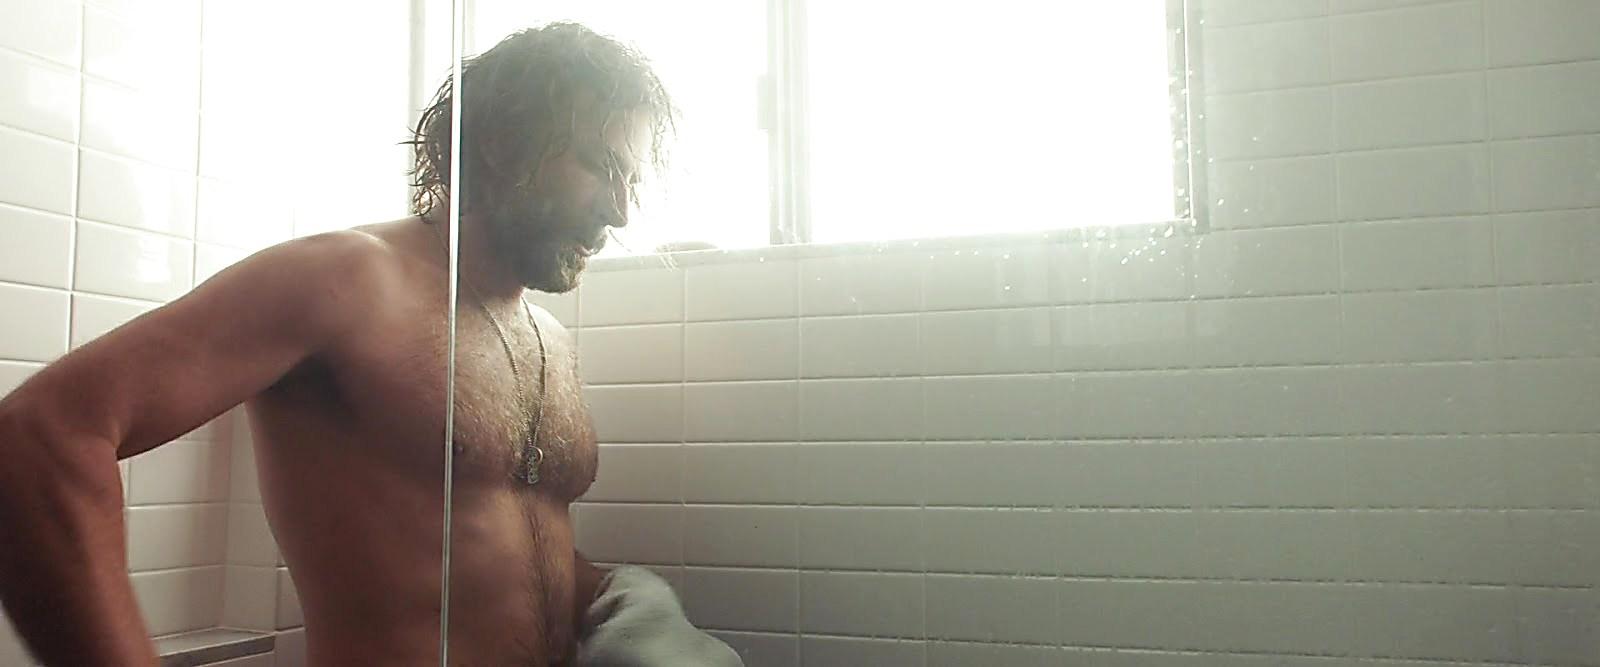 Bradley Cooper sexy shirtless scene January 16, 2019, 5am